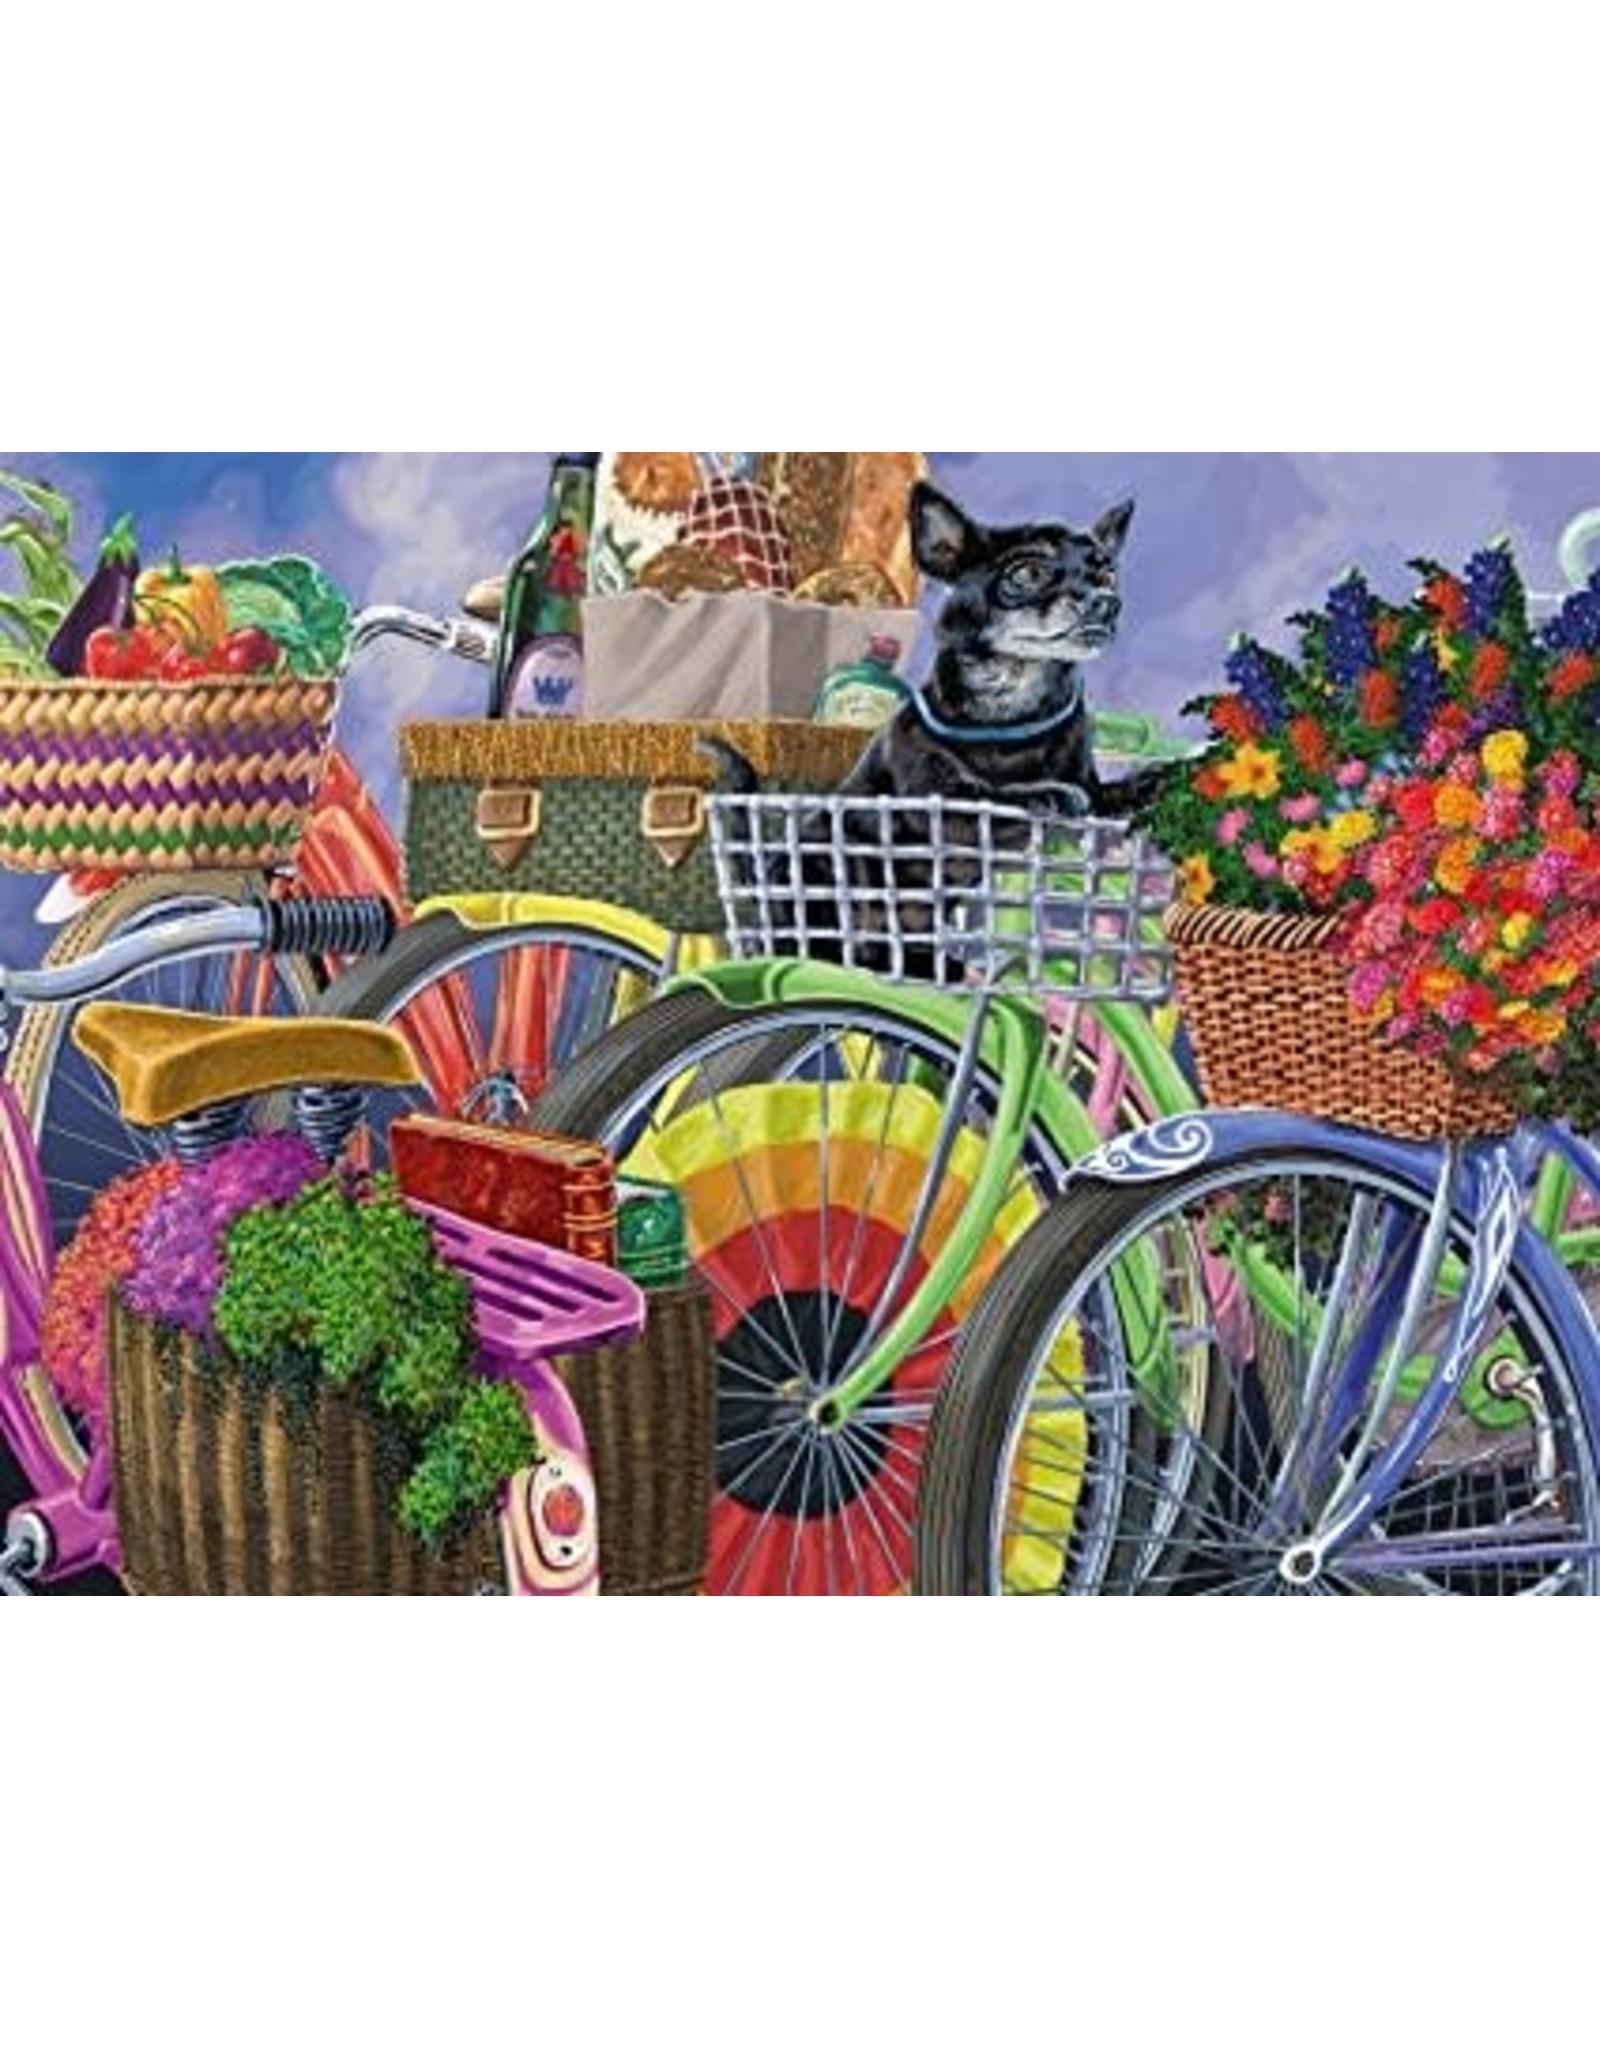 Ravensburger 300 pcs. Bicycle Group Puzzle